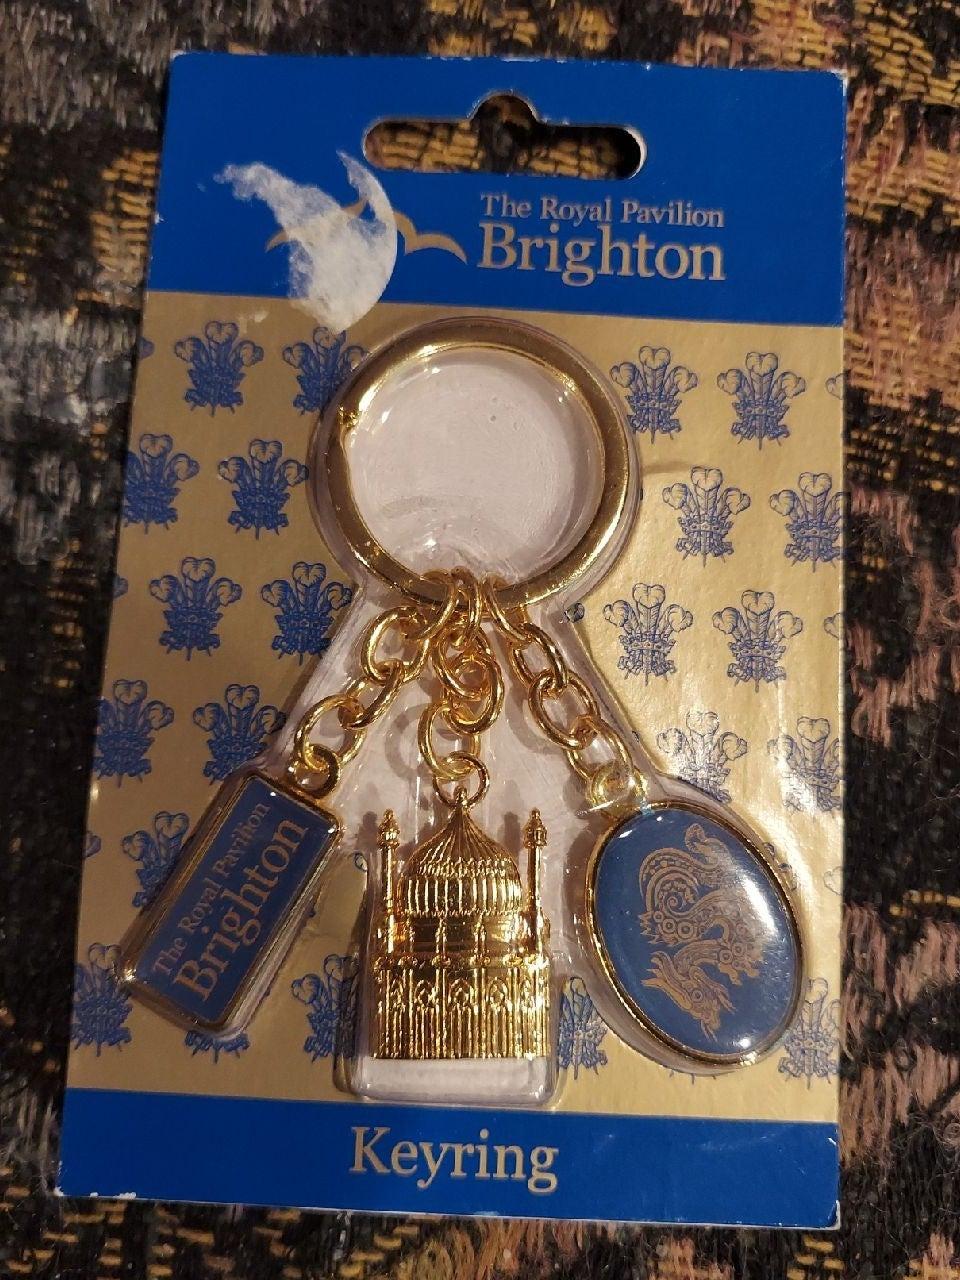 Royal pavilion Brighton vintage key ring